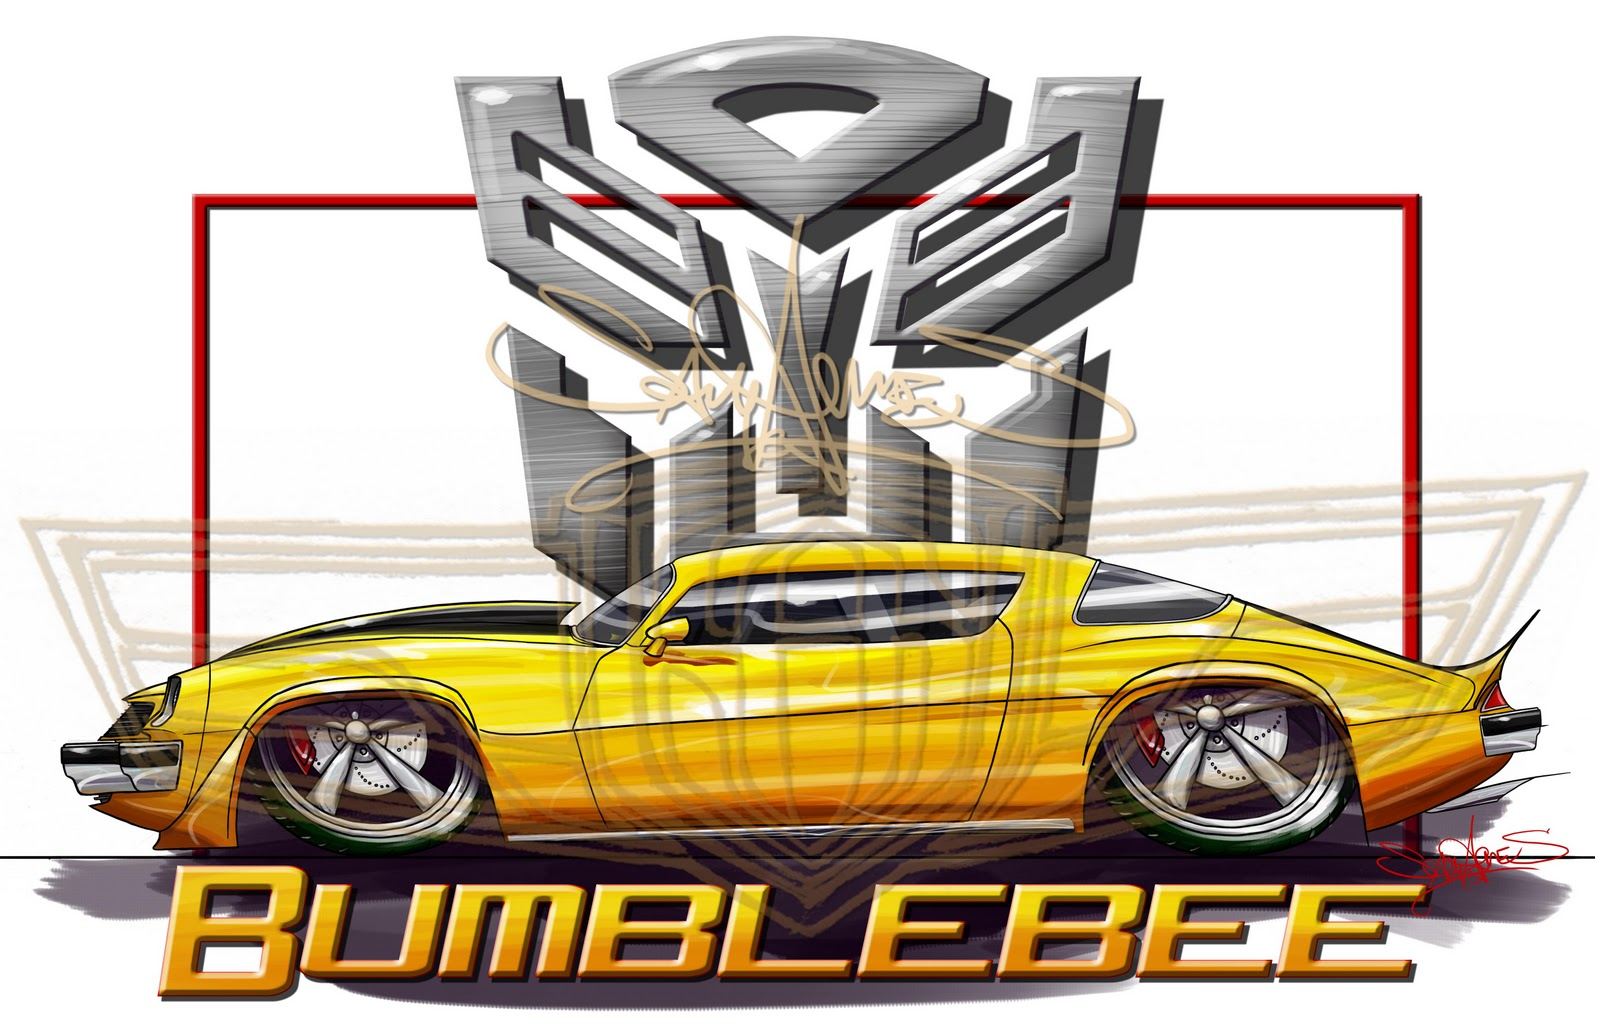 SAM AMES Bumblebee  1977 Camaro  Transformers